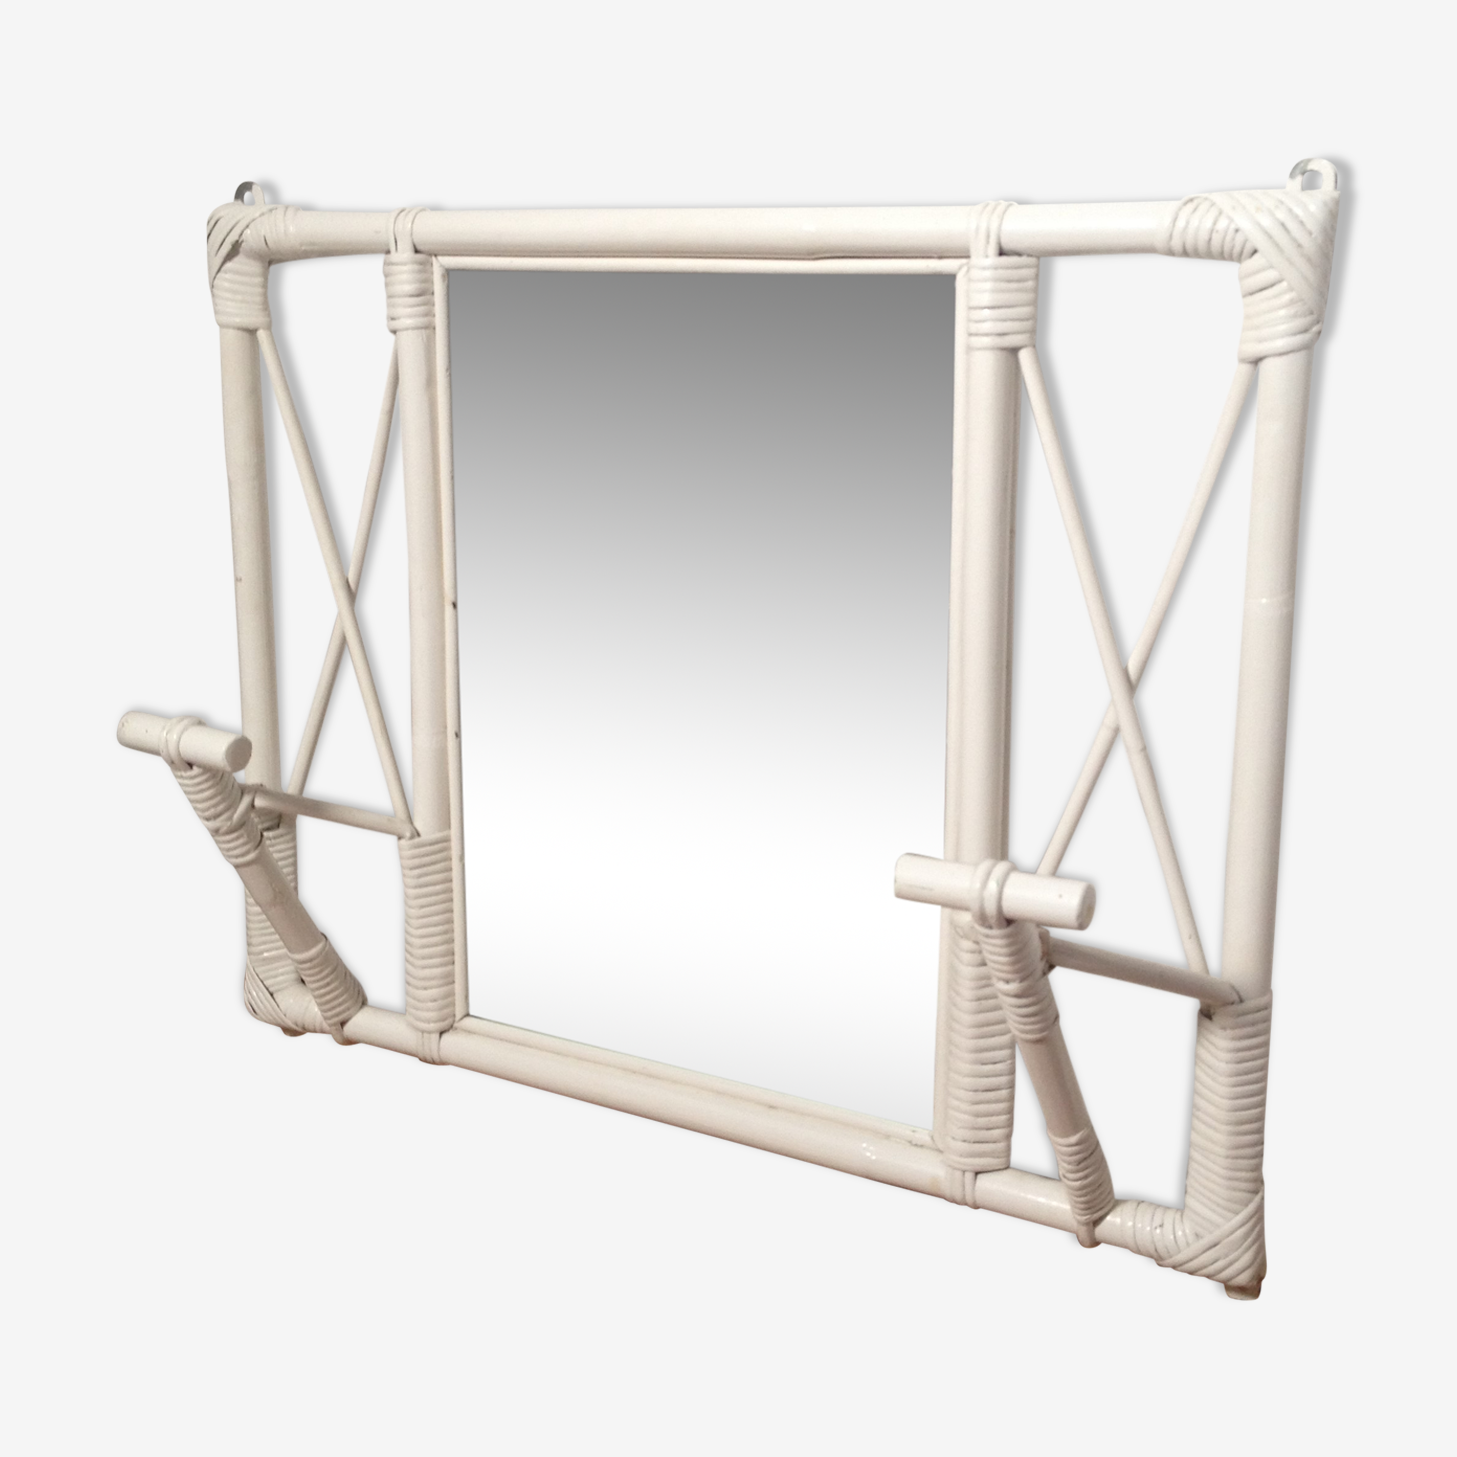 Coat rack white rattan mirror